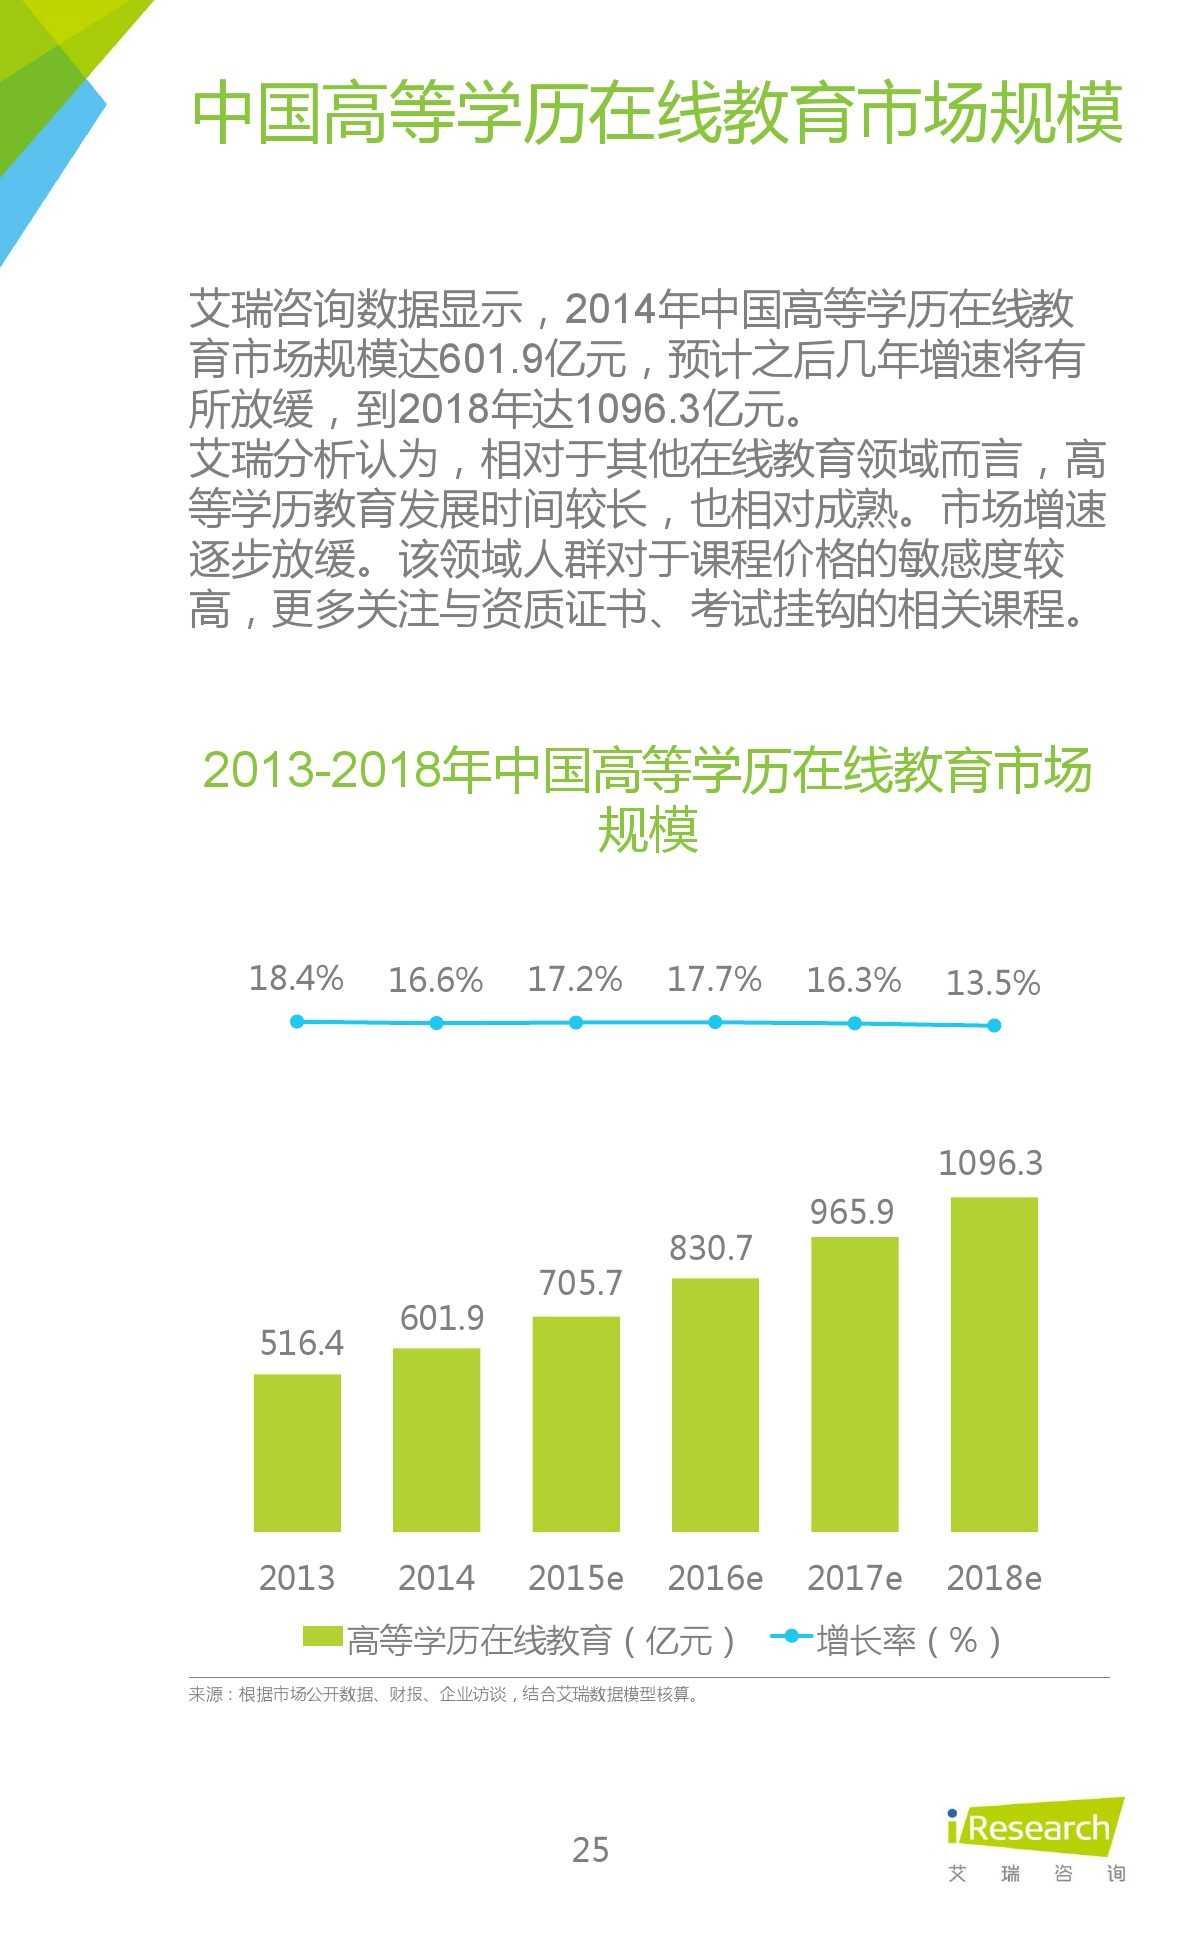 iResearch-2015年中国在线教育平台研究报告_000025